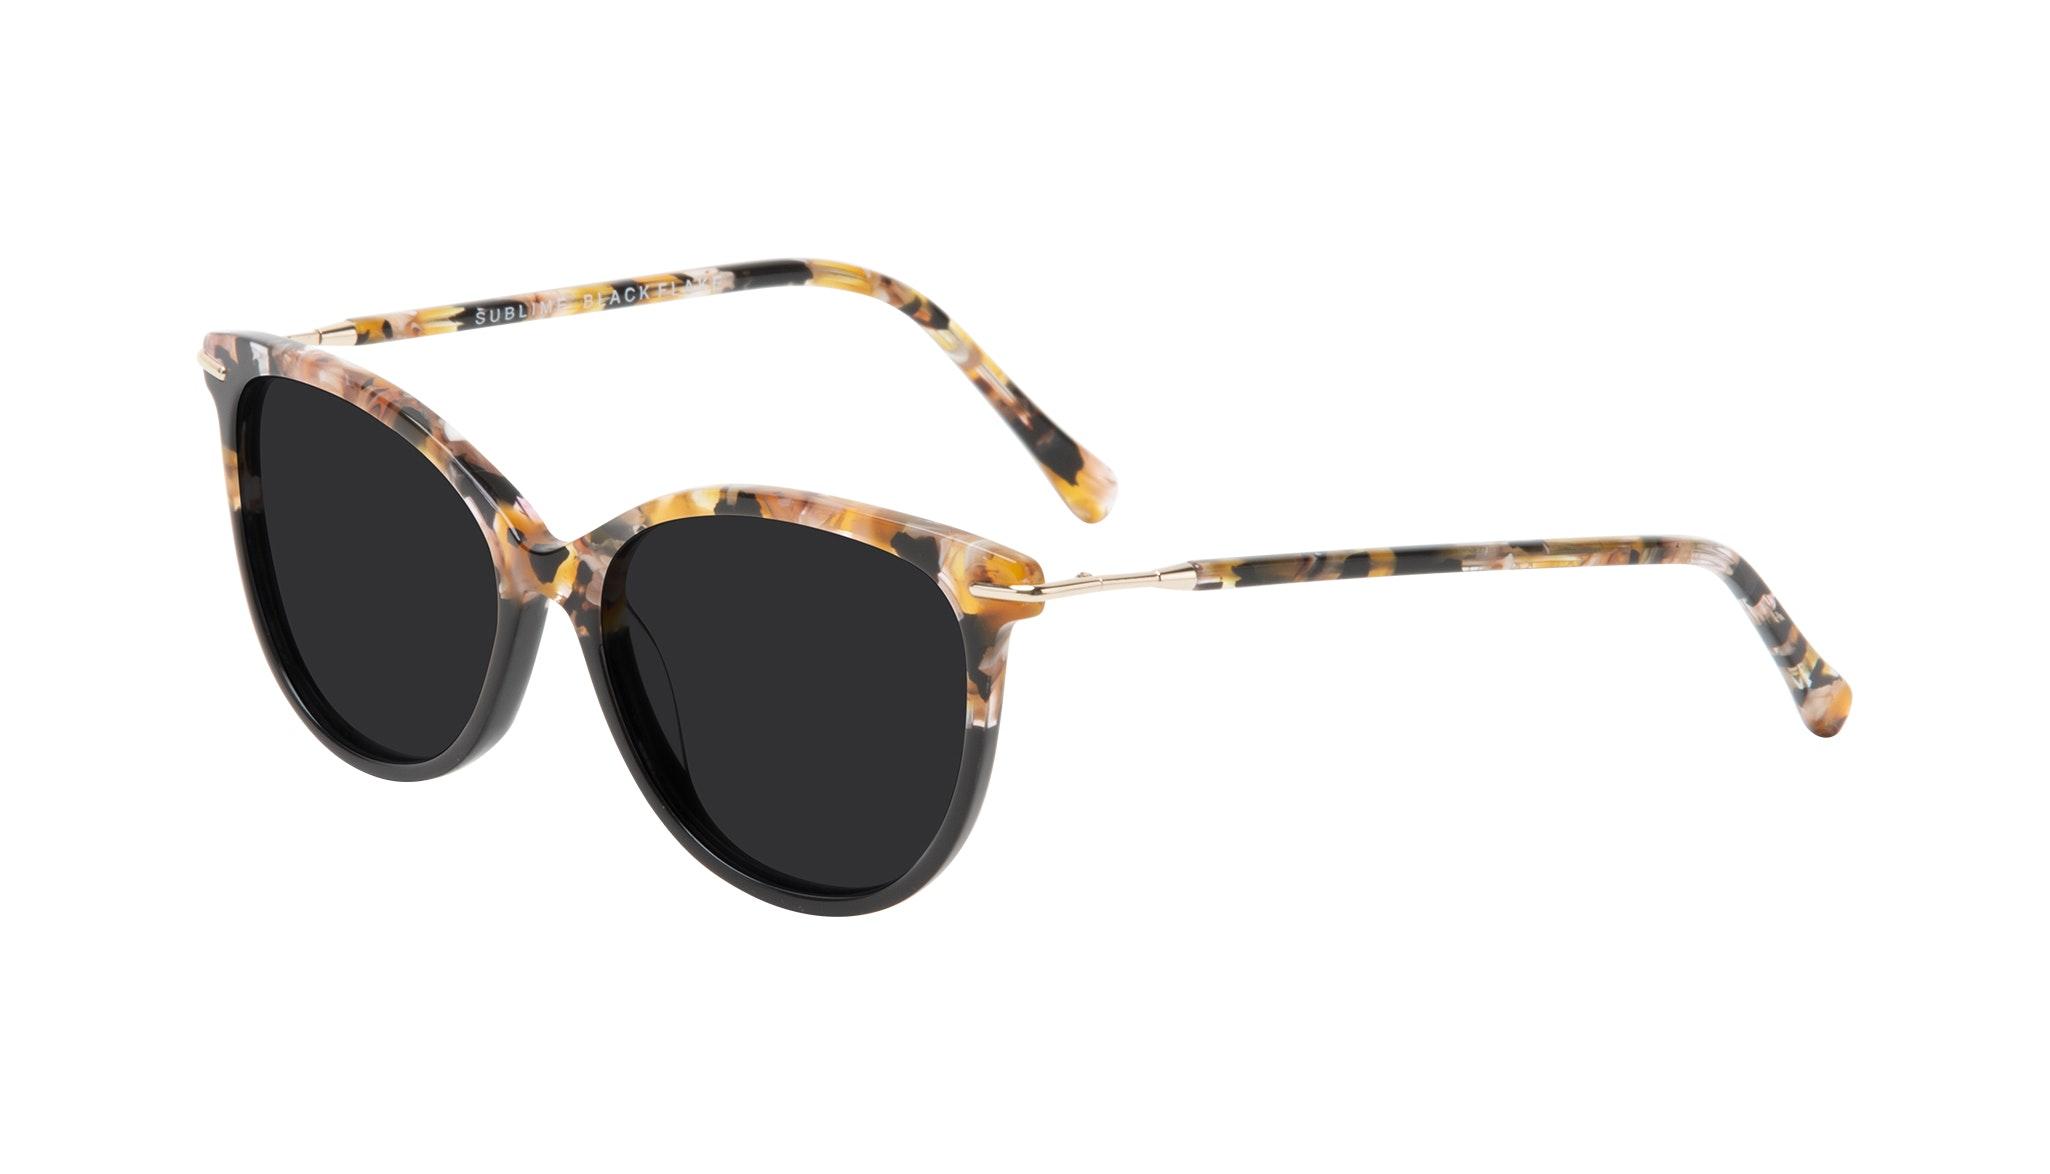 Affordable Fashion Glasses Round Sunglasses Women Sublime Black Flake Tilt